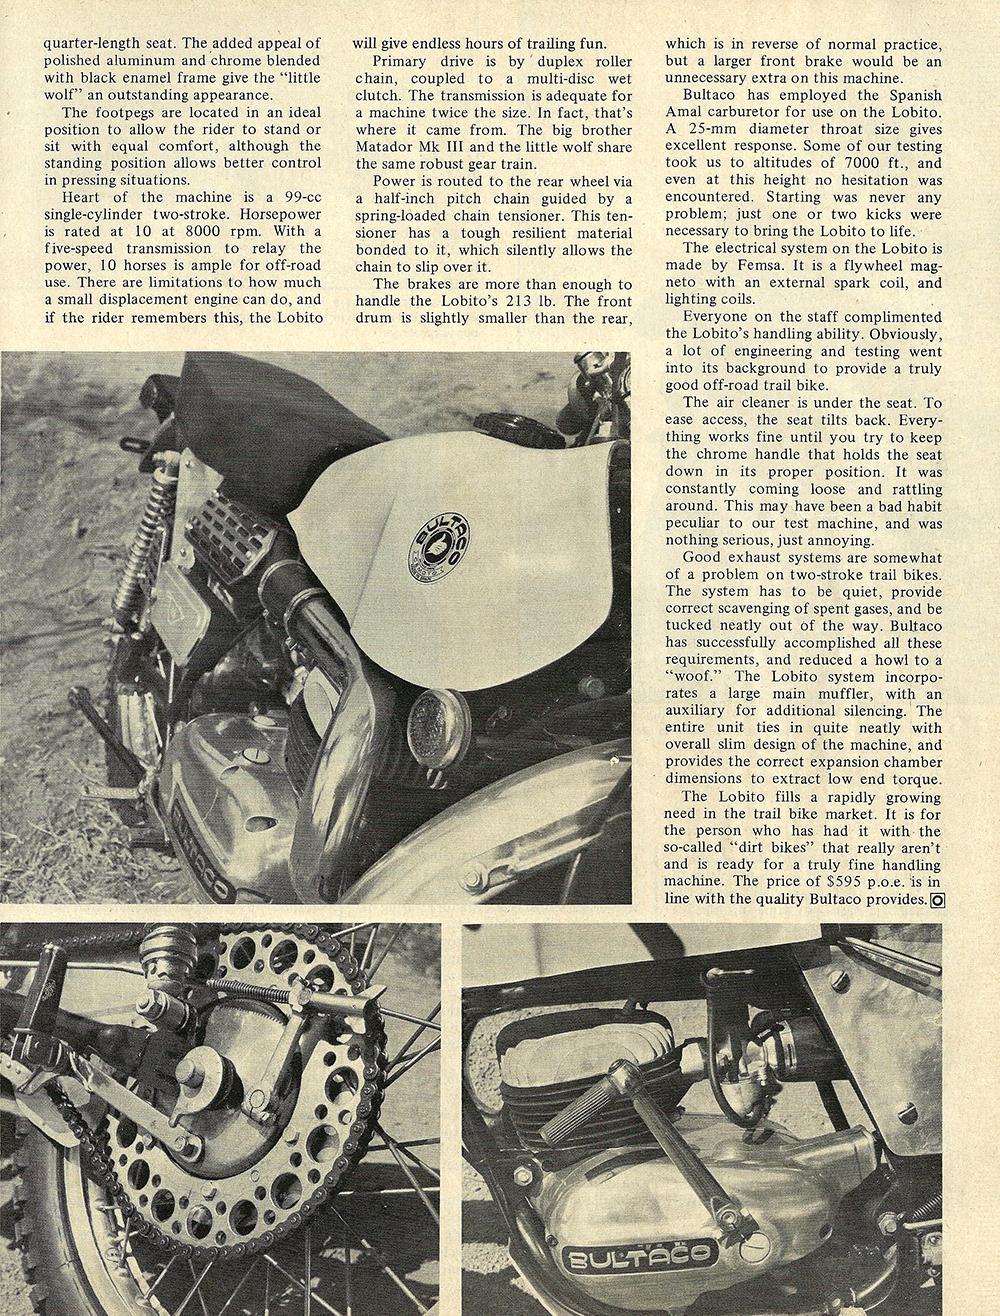 1970 Bultaco Lobito 100 mk2 road test 02.jpg